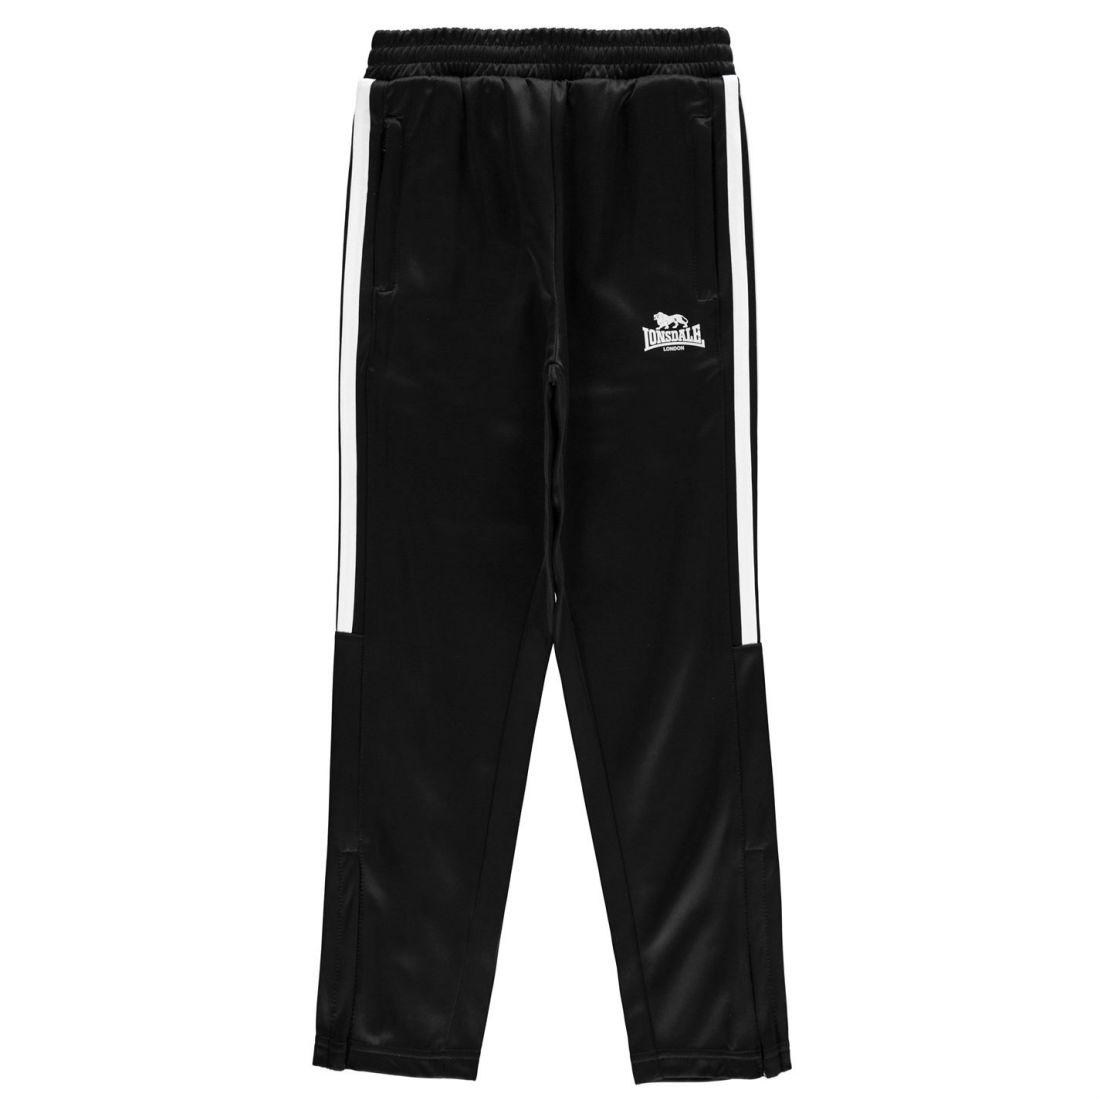 00998157 Lonsdale Kids Boys 2 Stripe Taped Pants Junior Poly Tracksuit ...